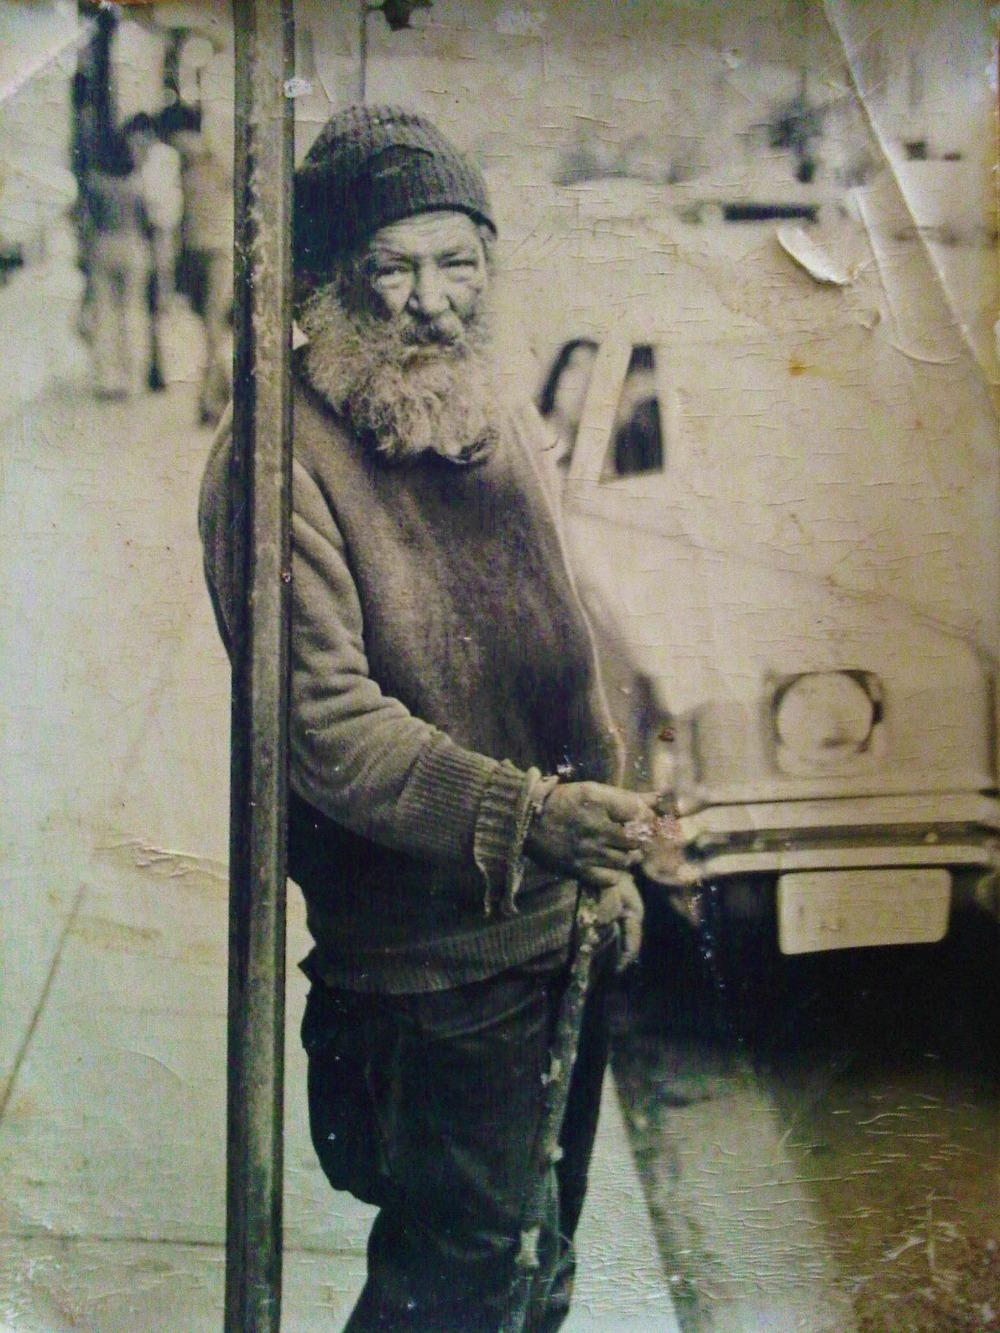 Homeless Man, Washington, DC 1960s